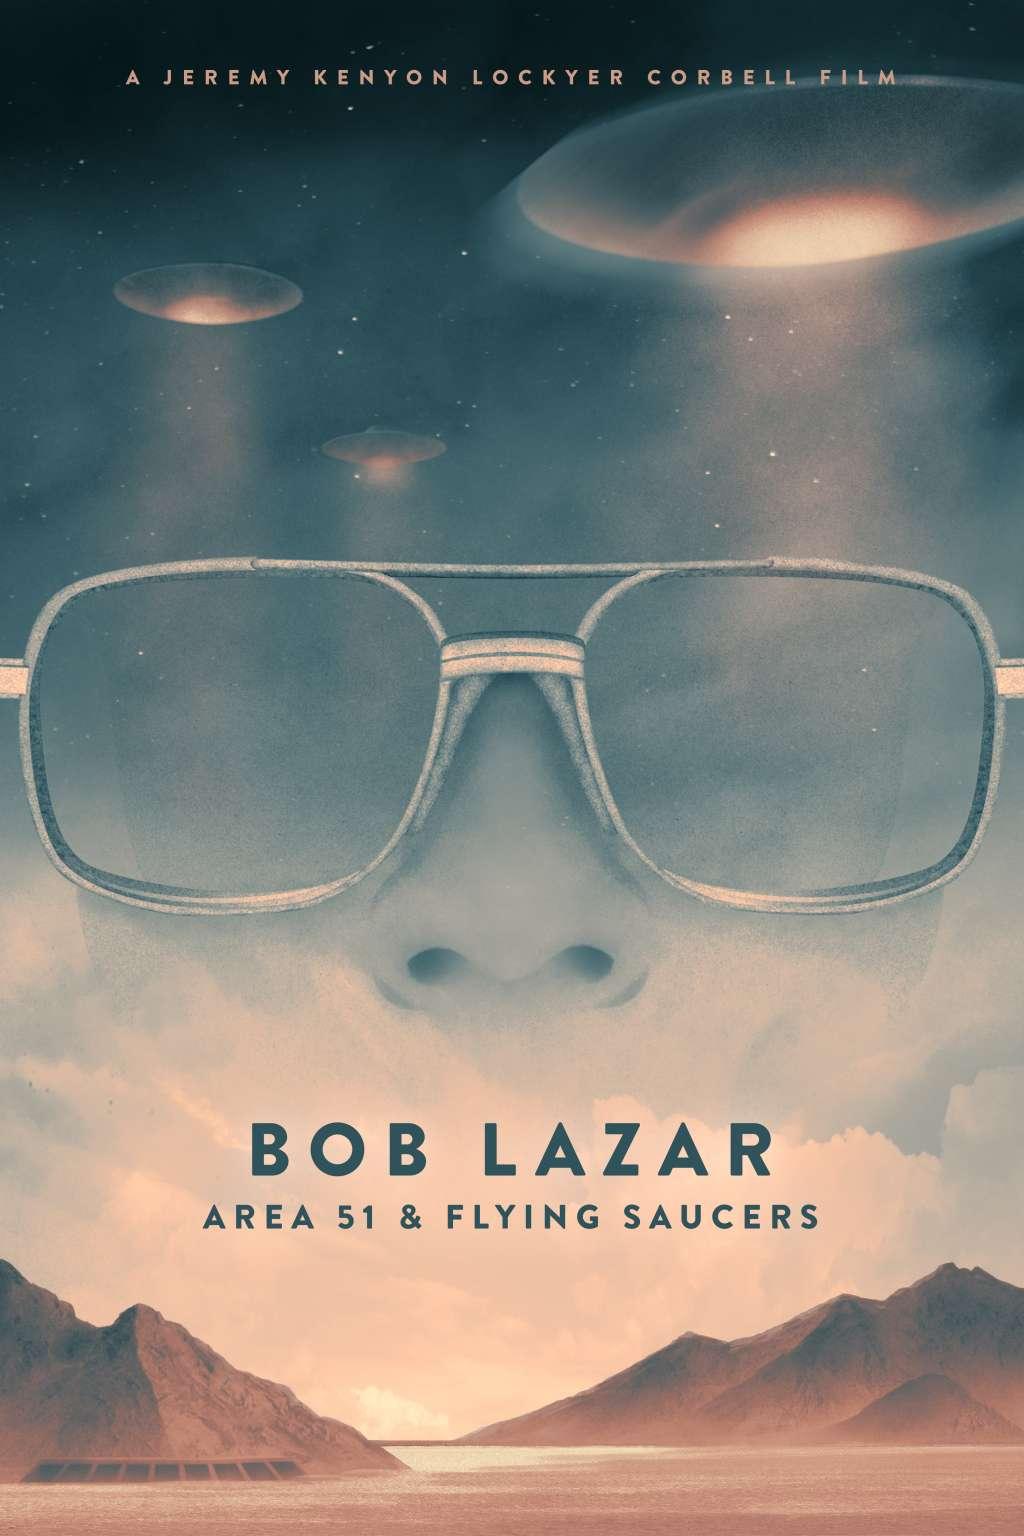 Bob Lazar: Area 51 & Flying Saucers kapak